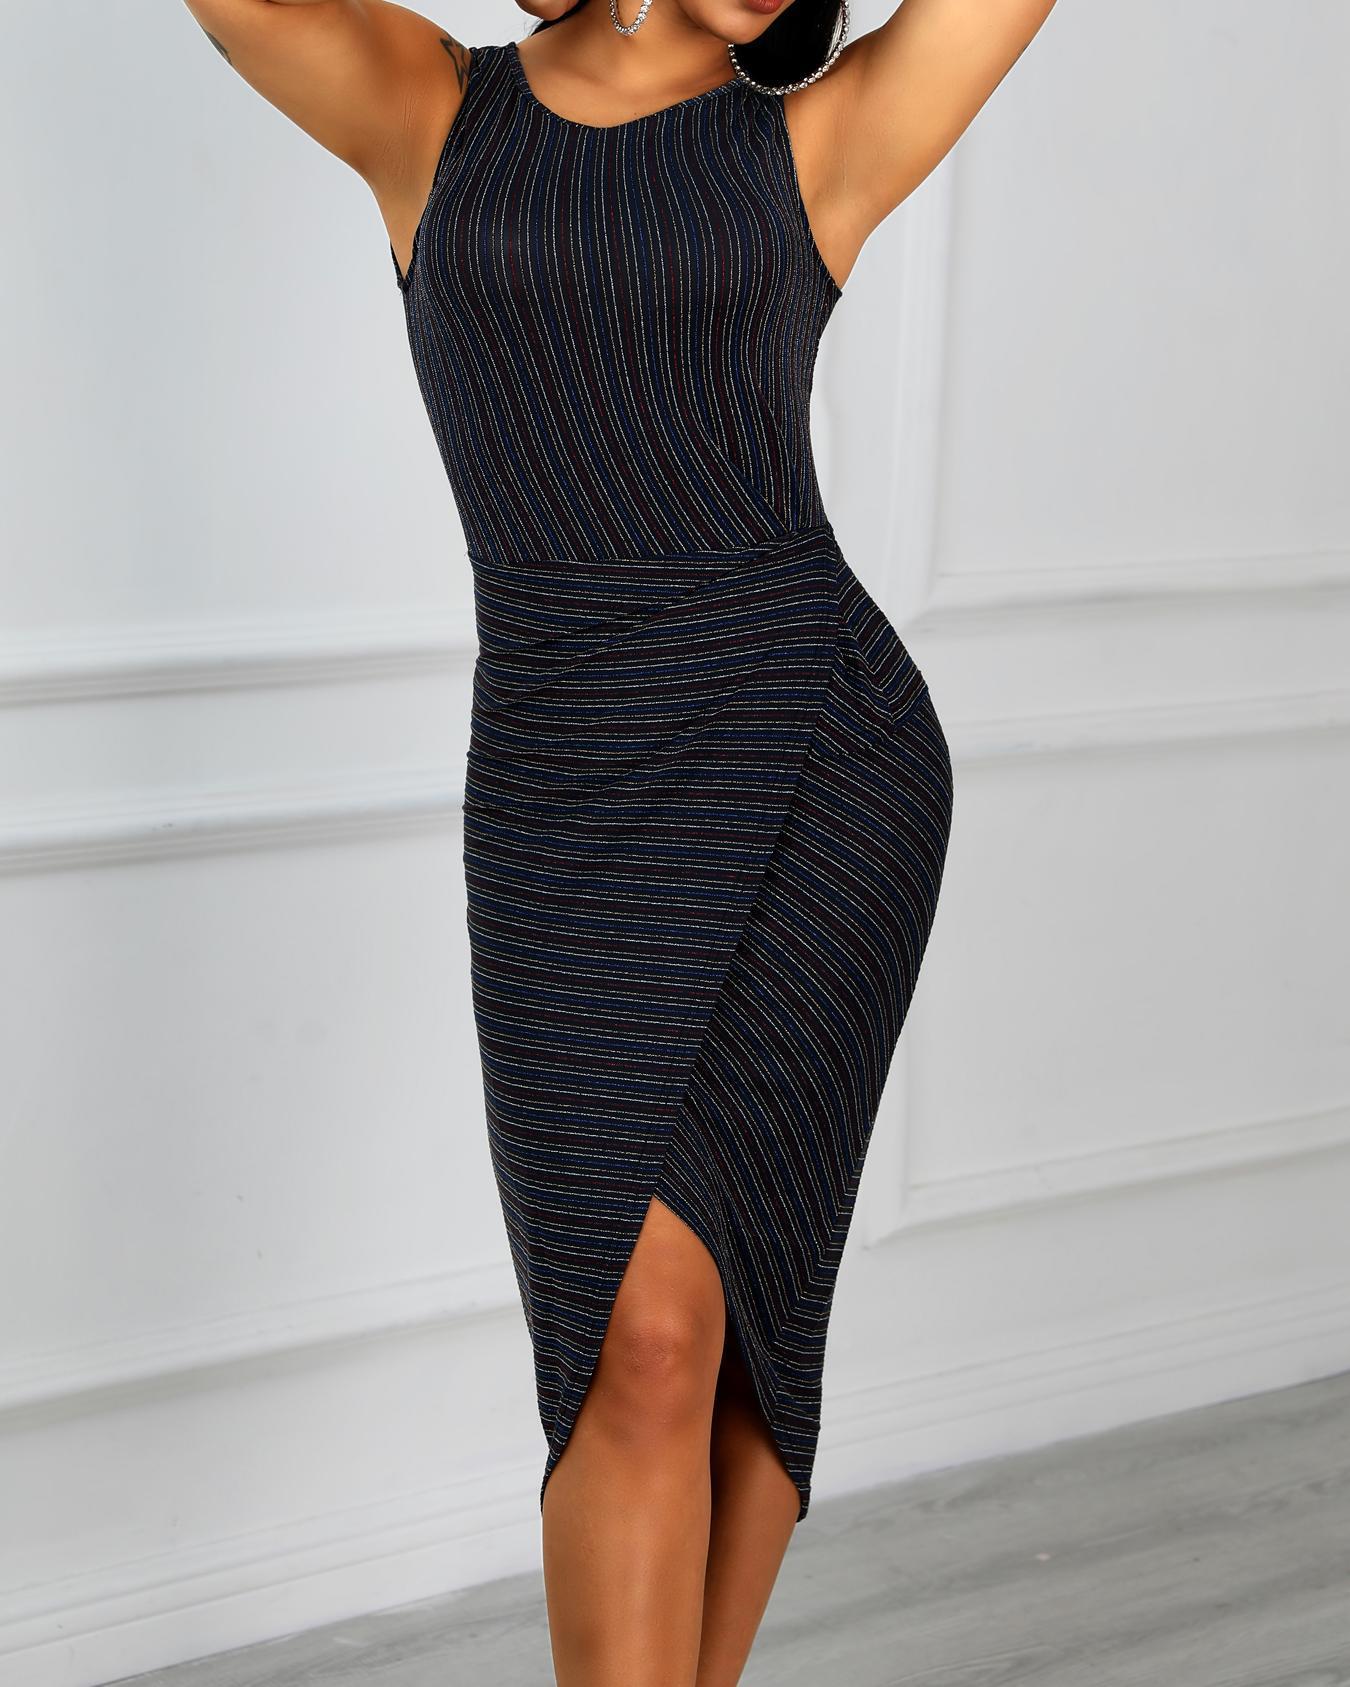 Shiny Stripes Scrunched Irregular Party Dress